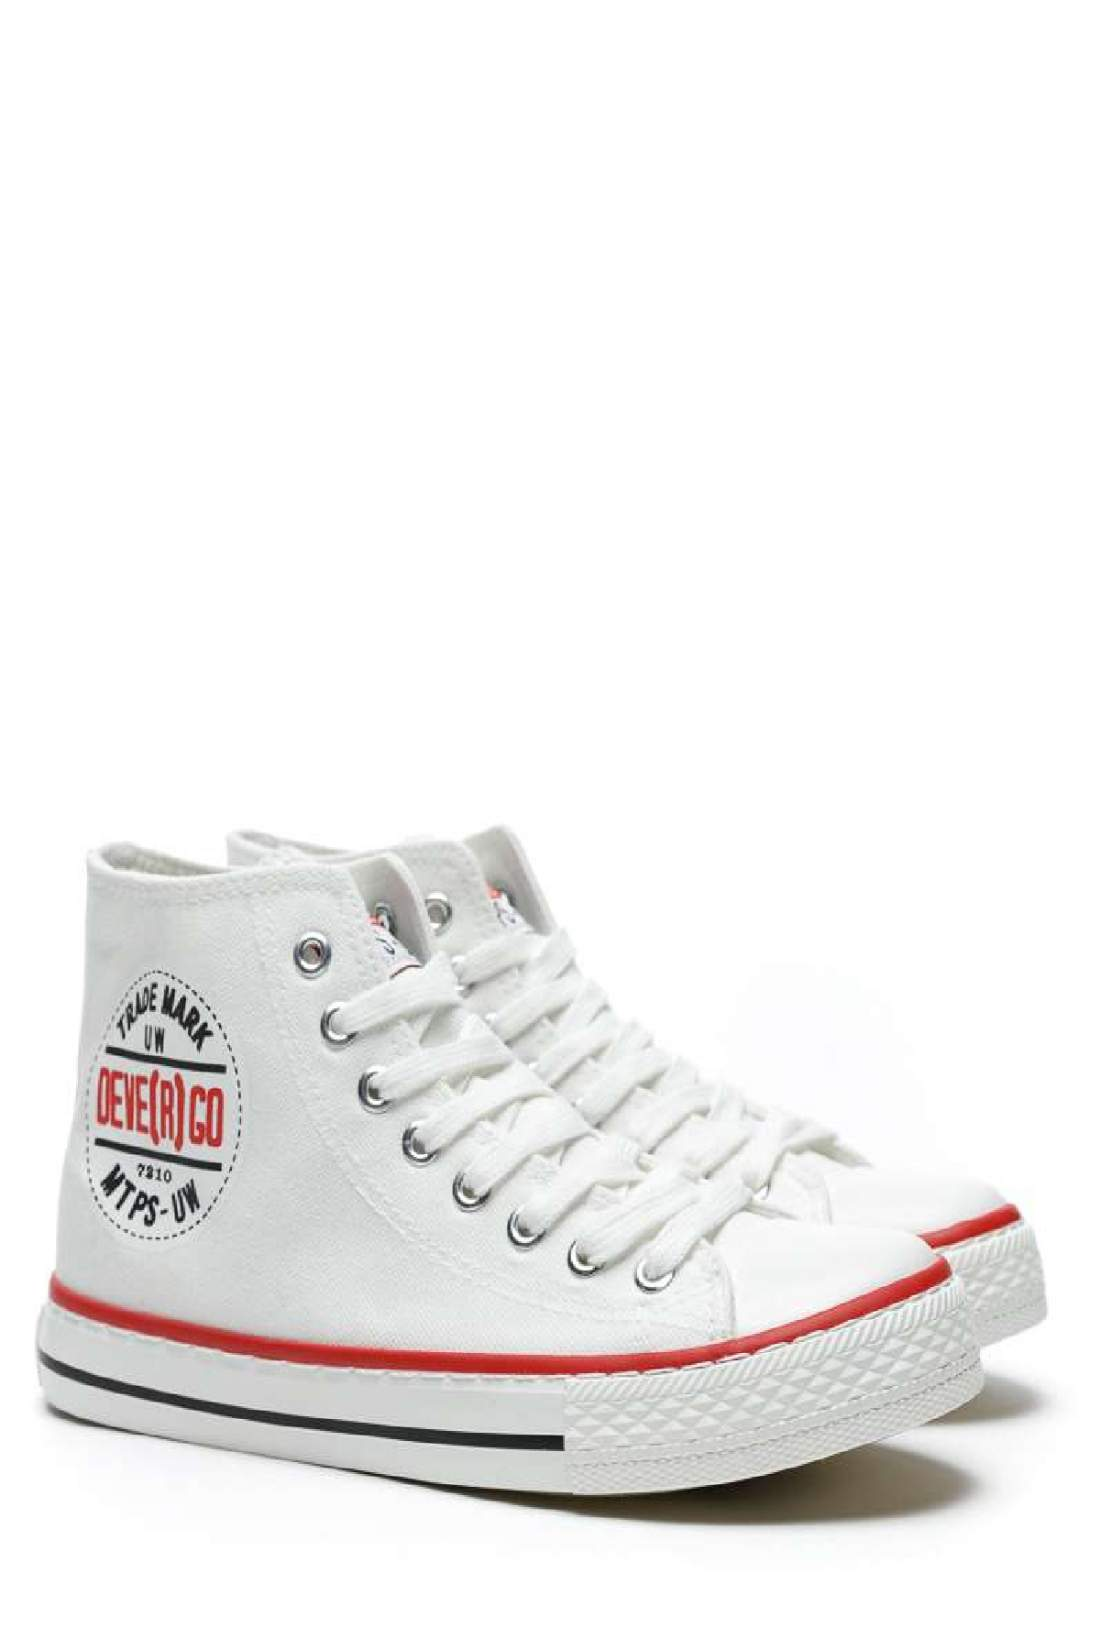 Devergo ALEXA női tornacipő - Fehér